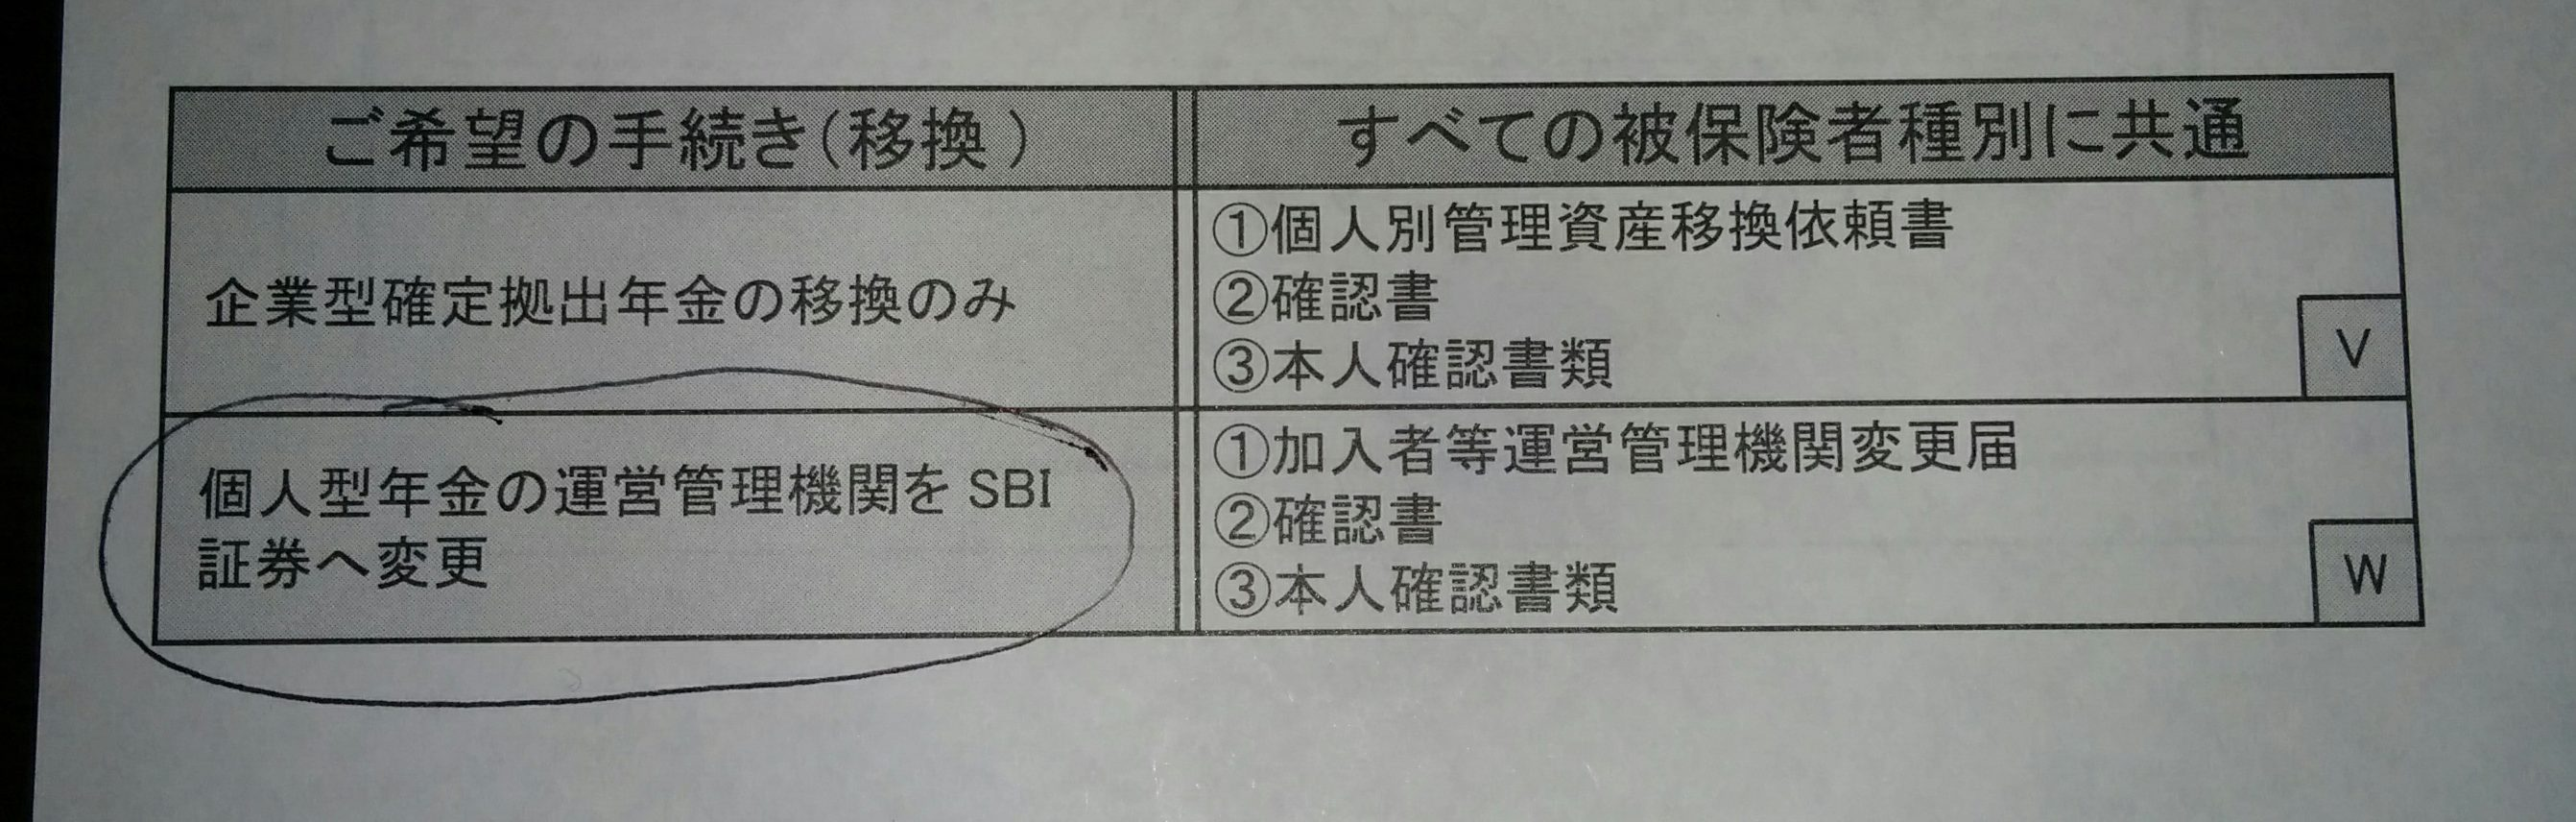 sbi ideco 提出書類